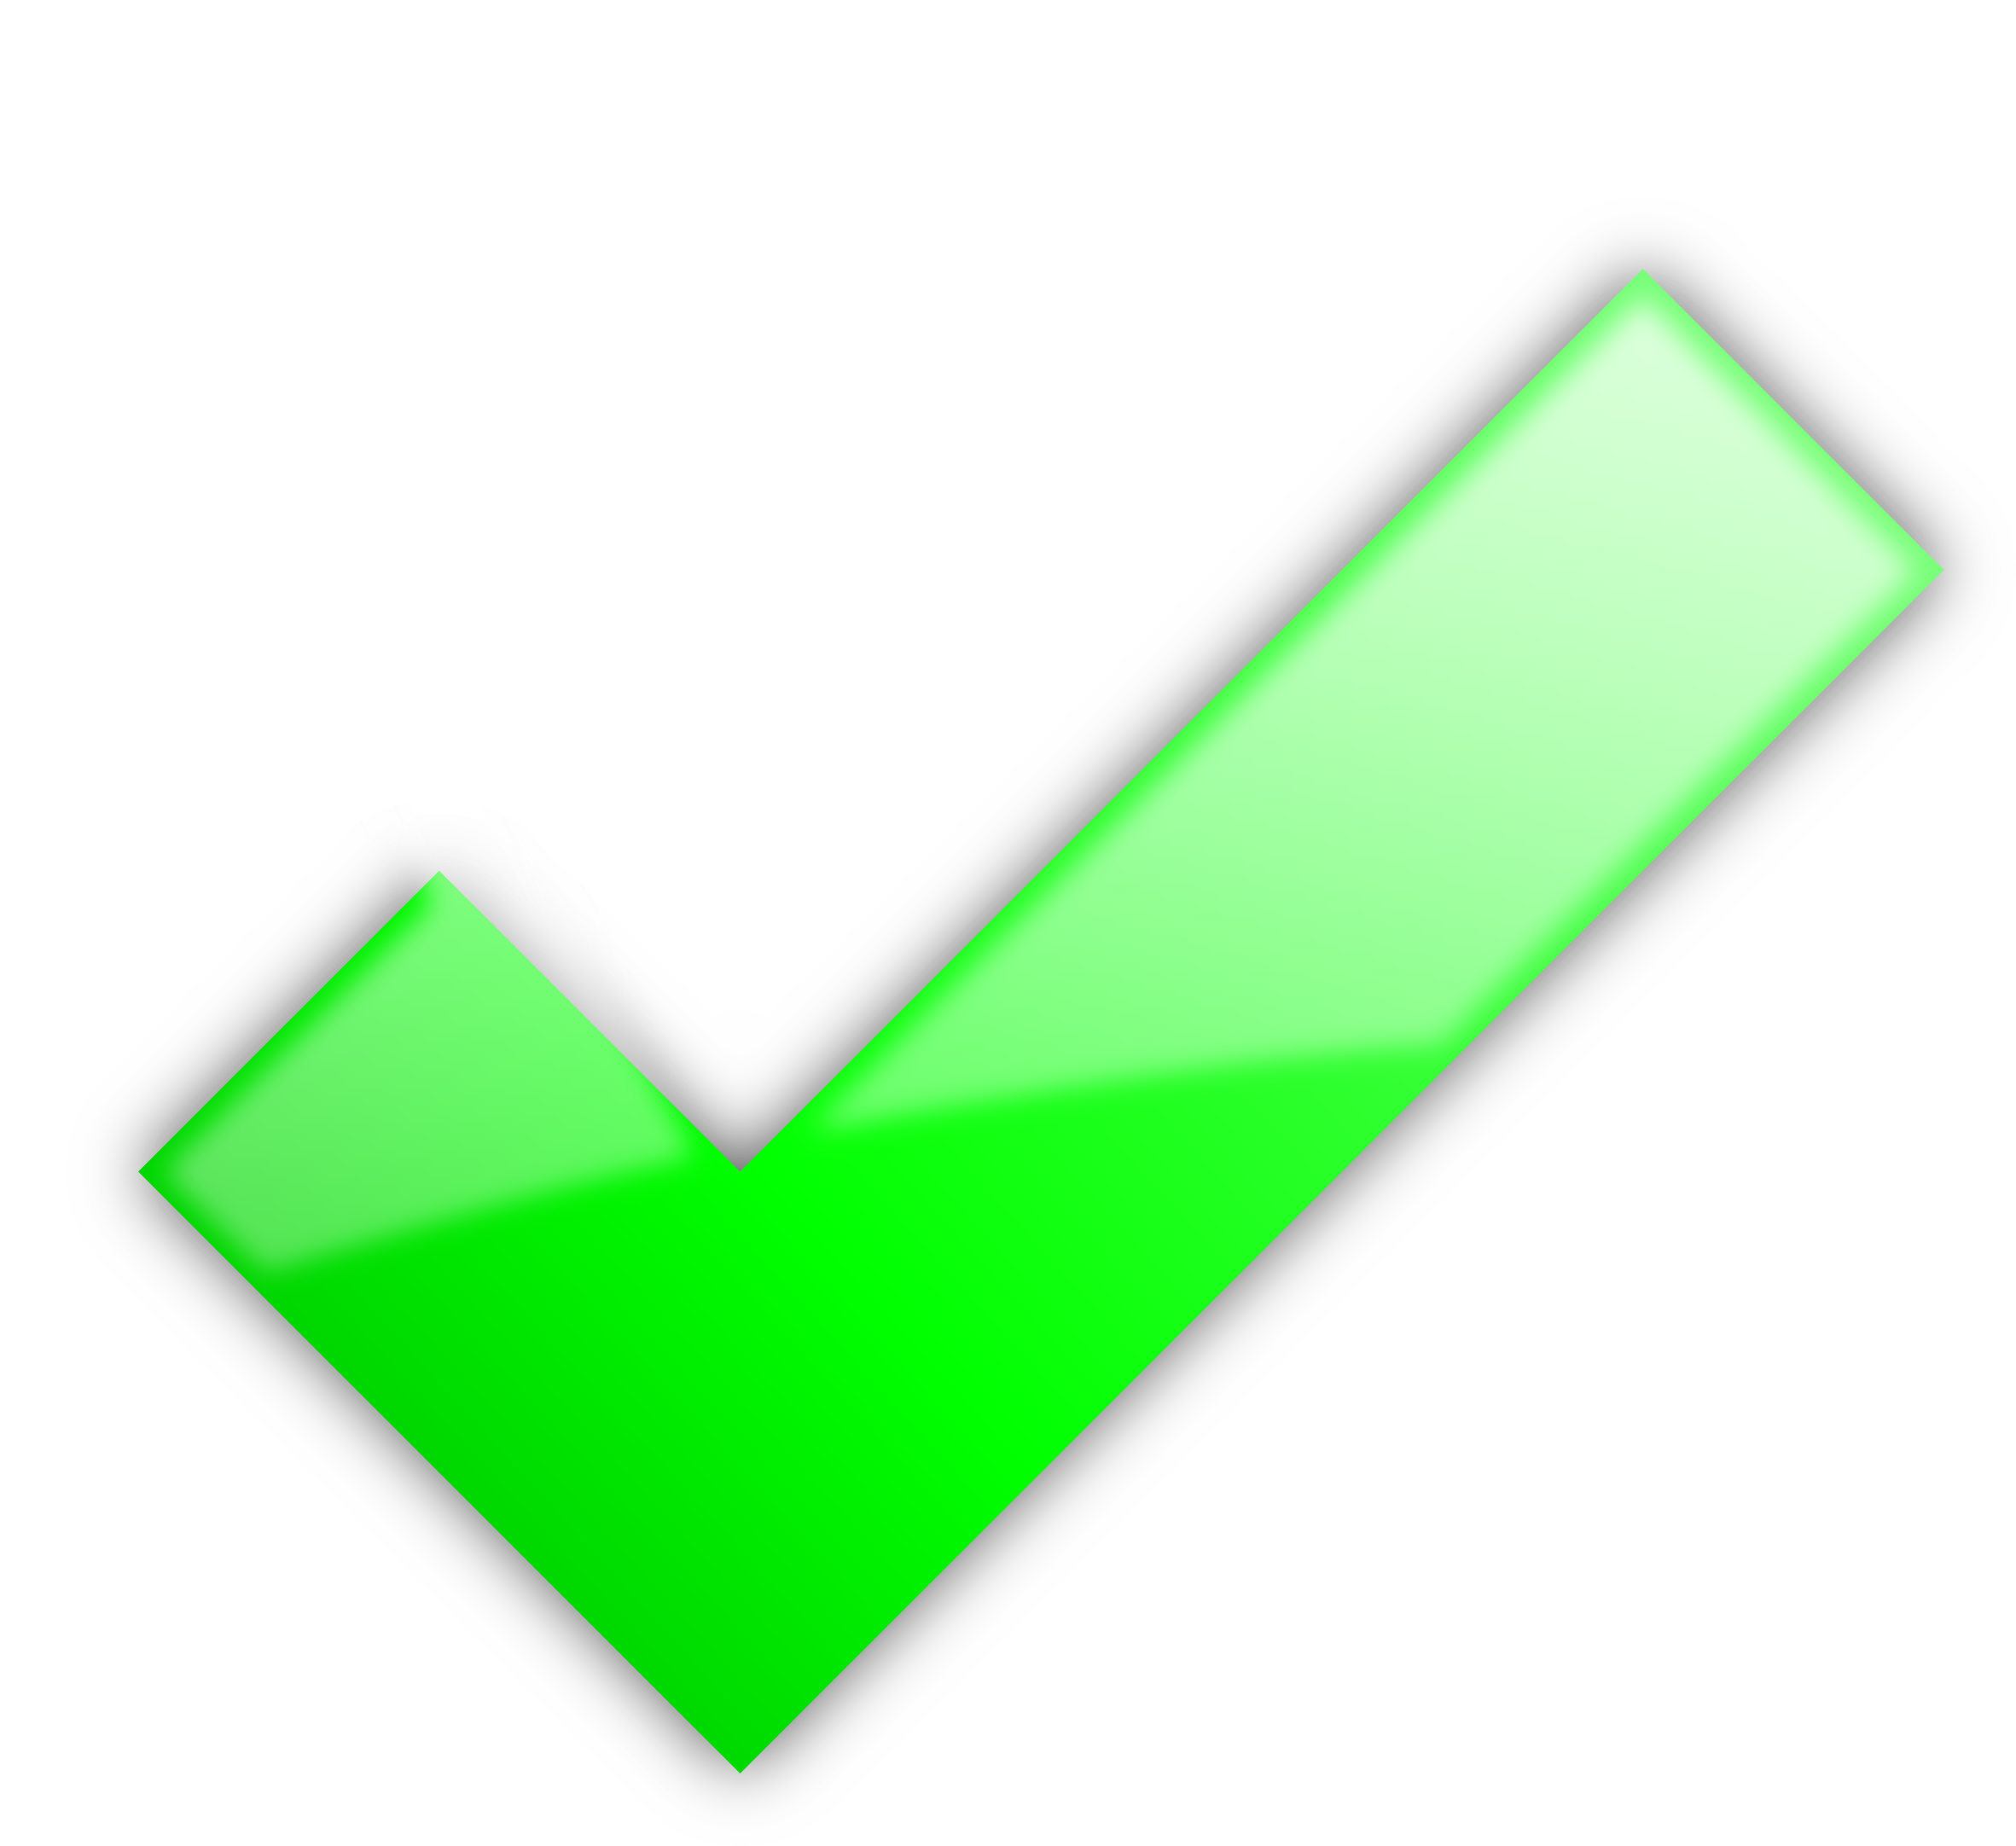 Check Clipart Big Green Big Green Check Mark 2400x2400 Png Clipart Download